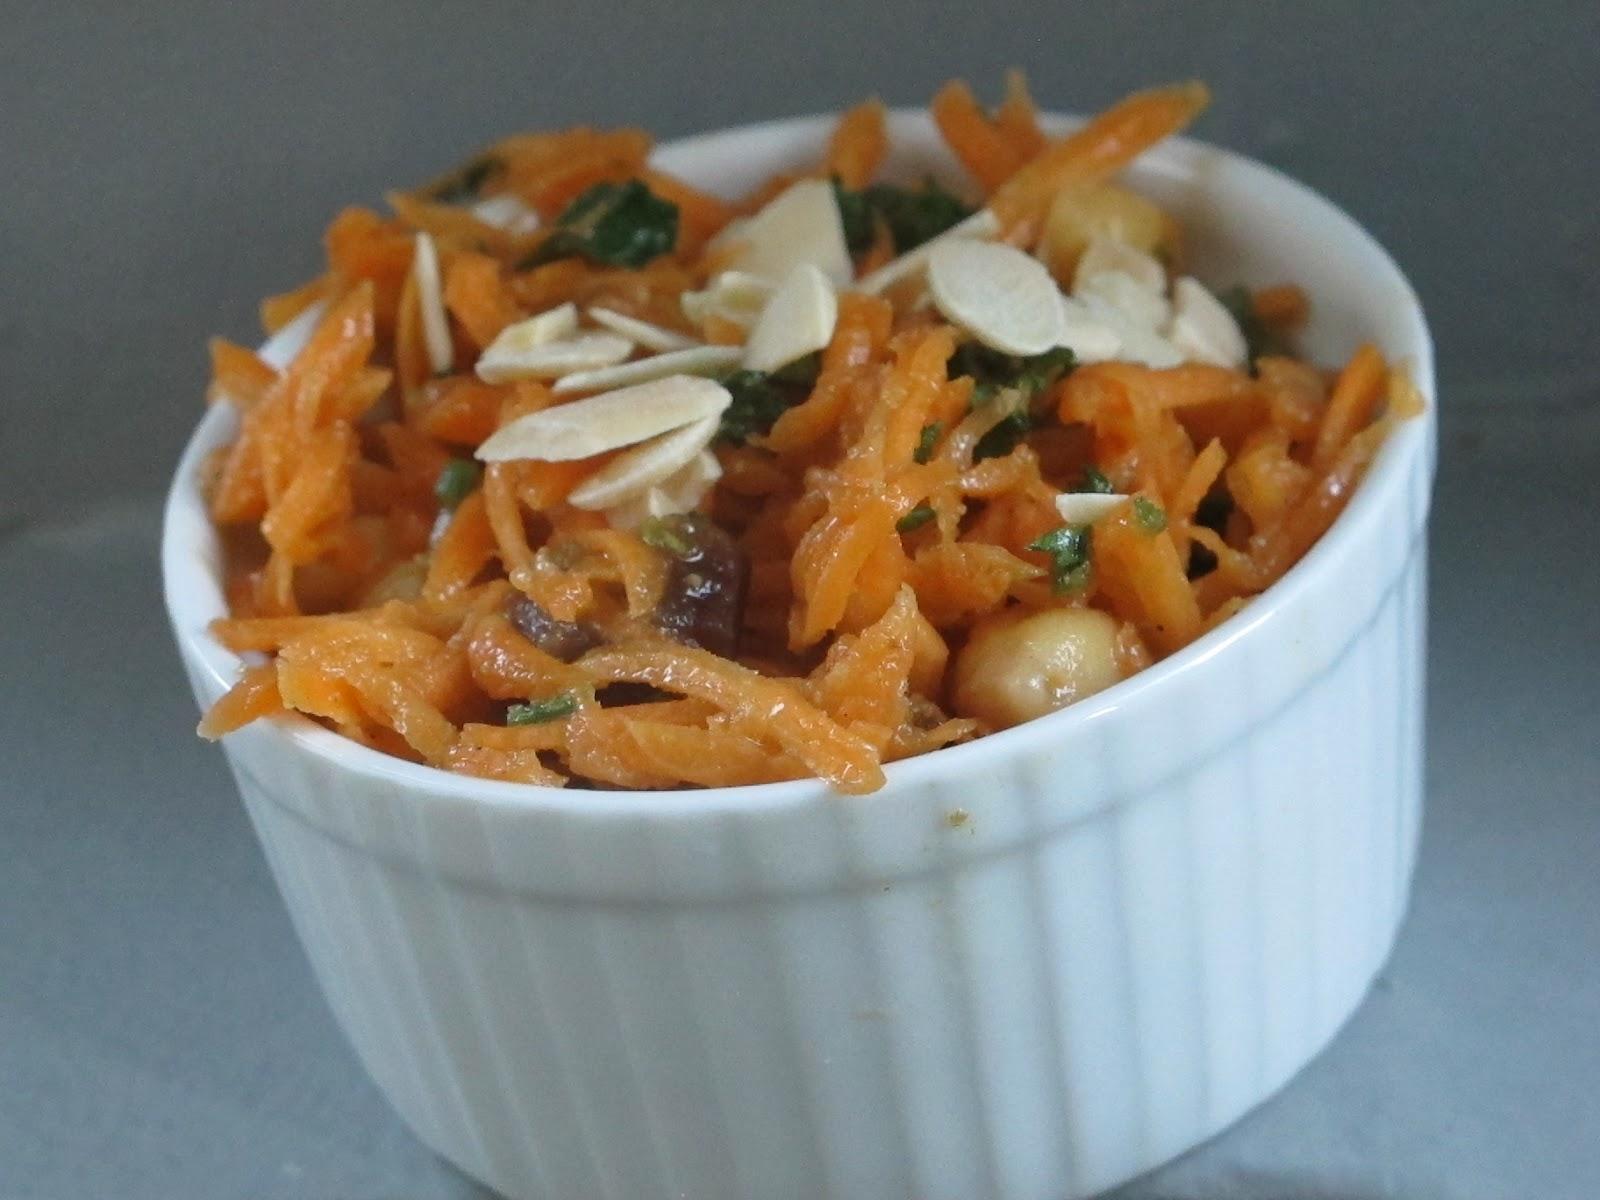 Dahlia_Abraham-Klein_Moroccan_Carrot_Chickpea_Salad_Tzimmes.JPG